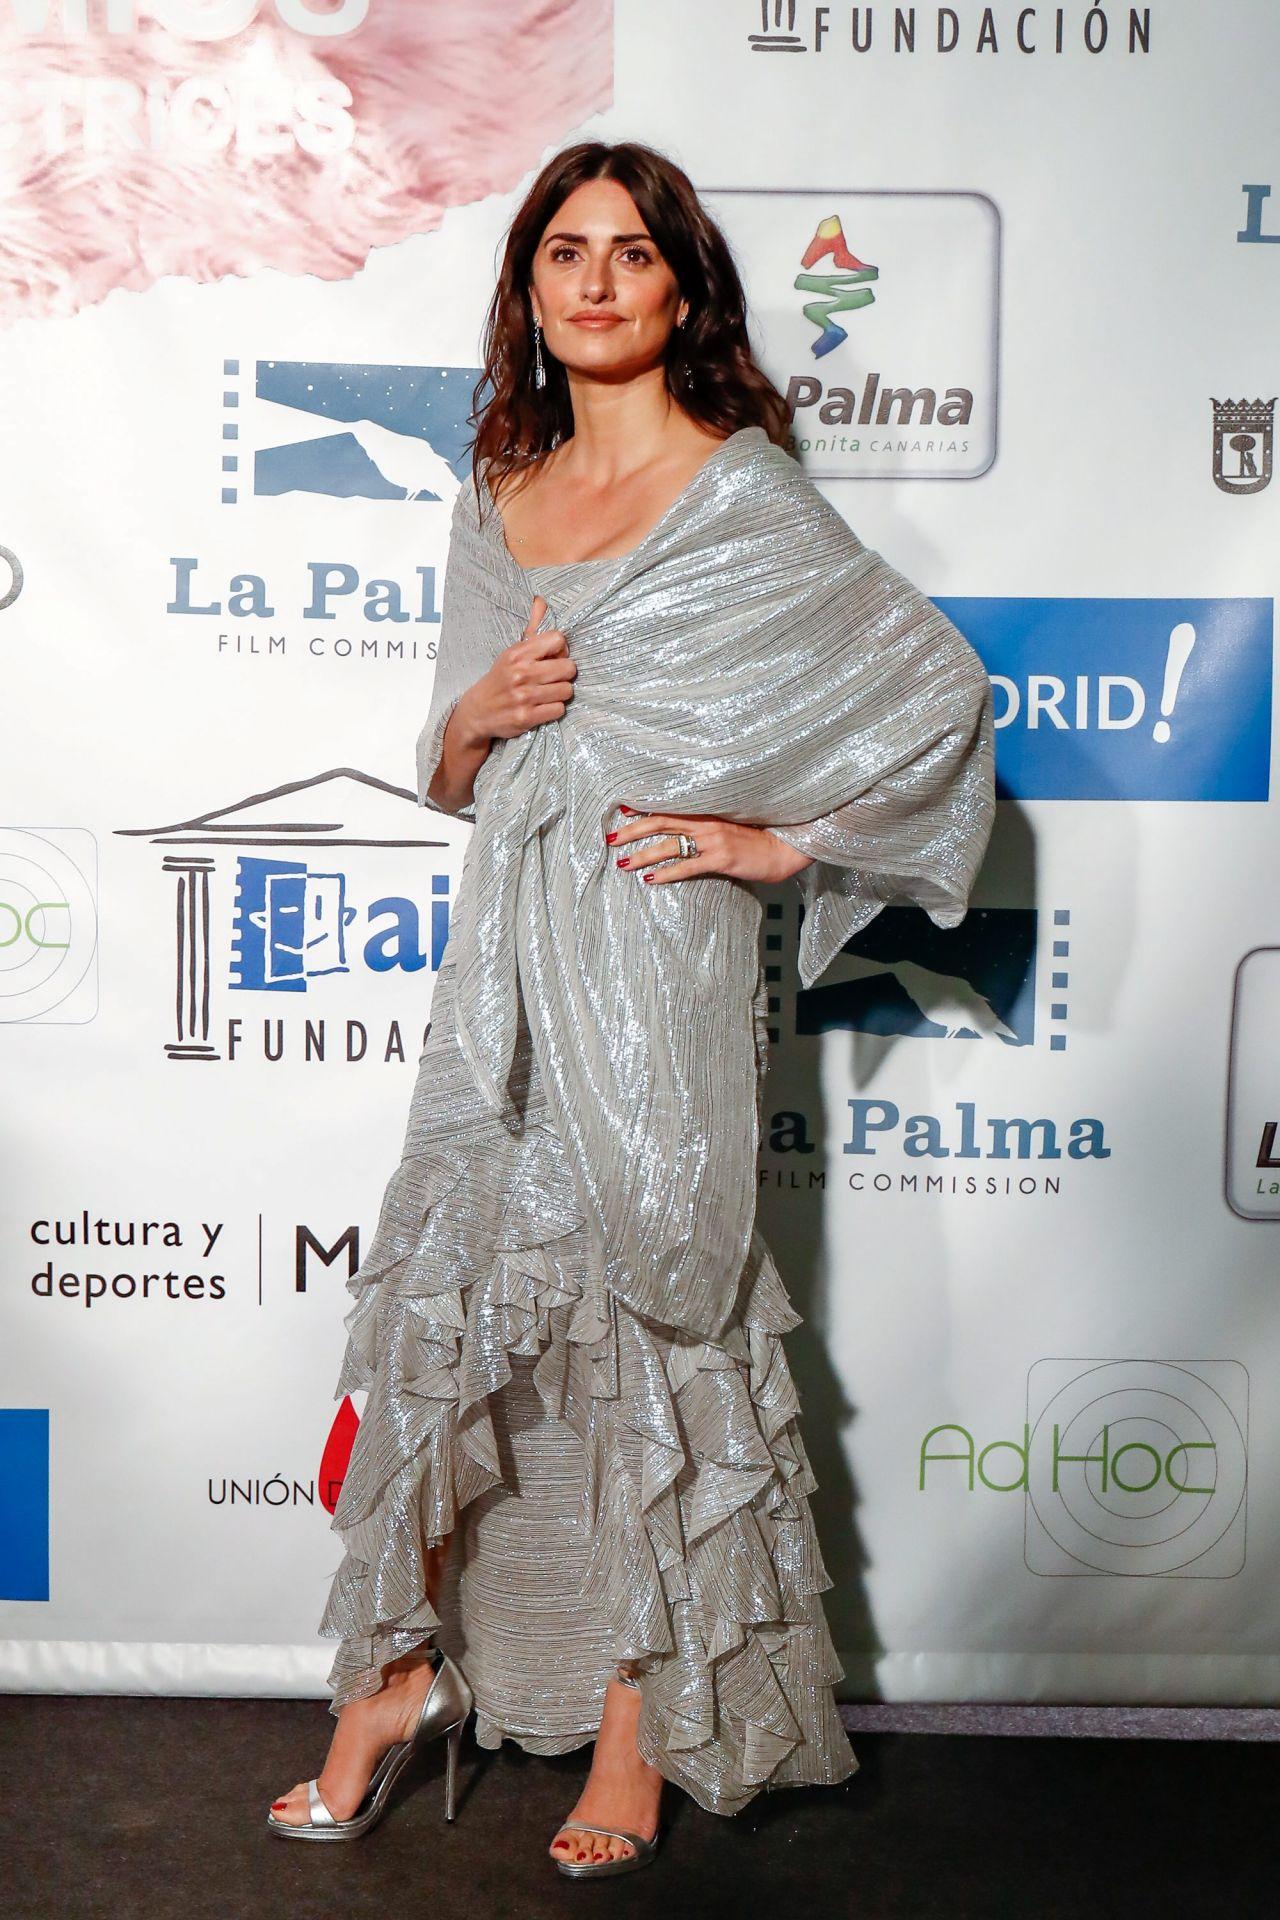 http://celebmafia.com/wp-content/uploads/2018/03/penelope-cruz-actors-and-actresses-union-awards-2018-in-madrid-6.jpg